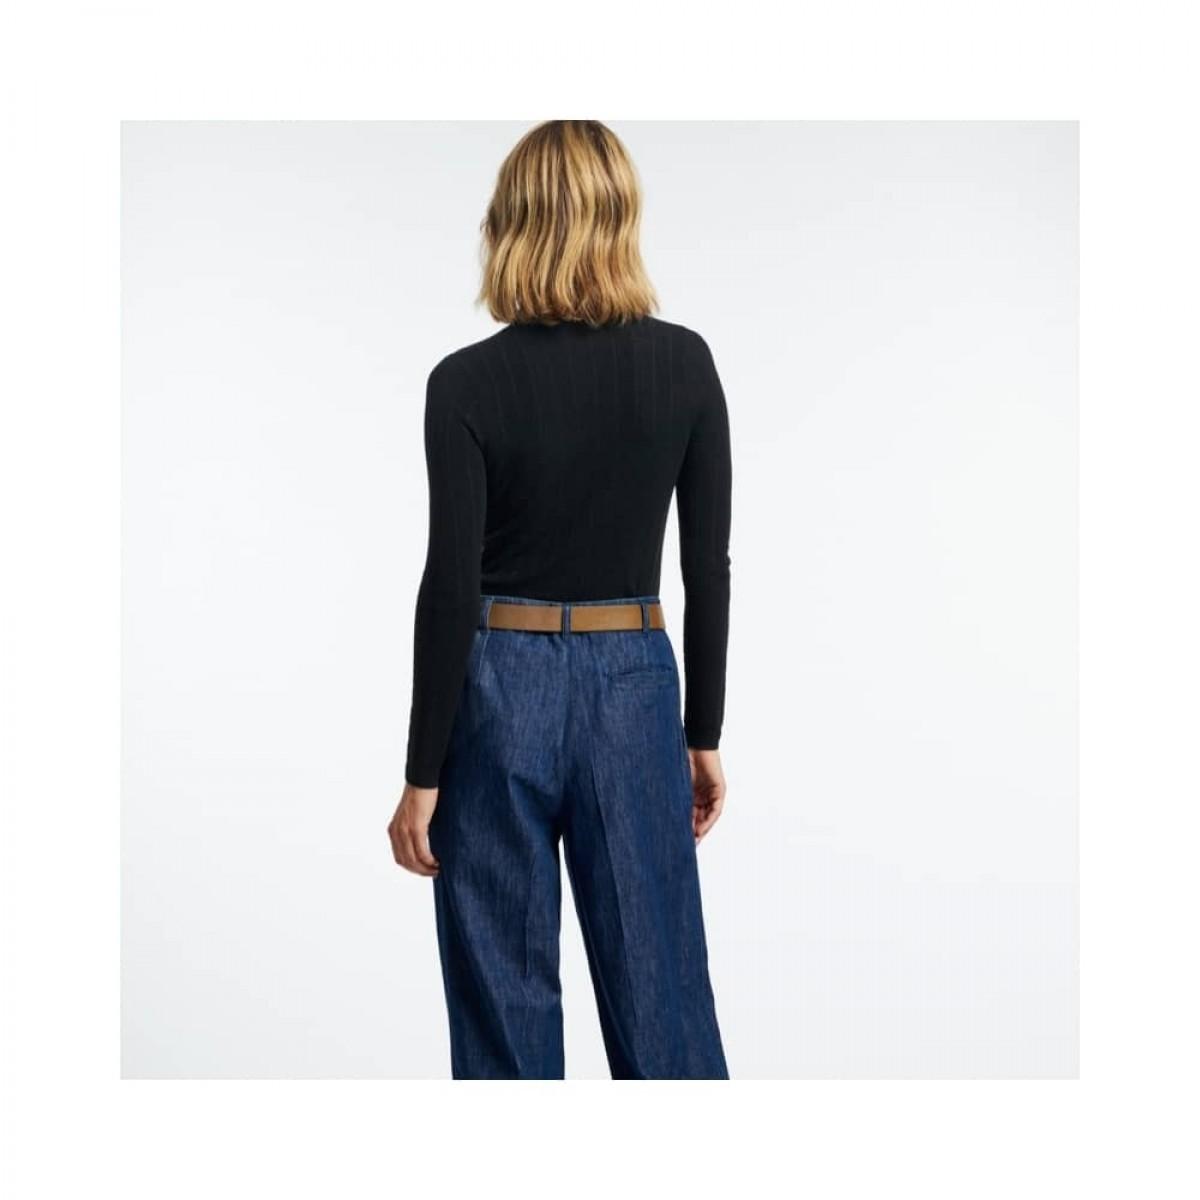 sylvanie rullekrave strik - black - model ryggen